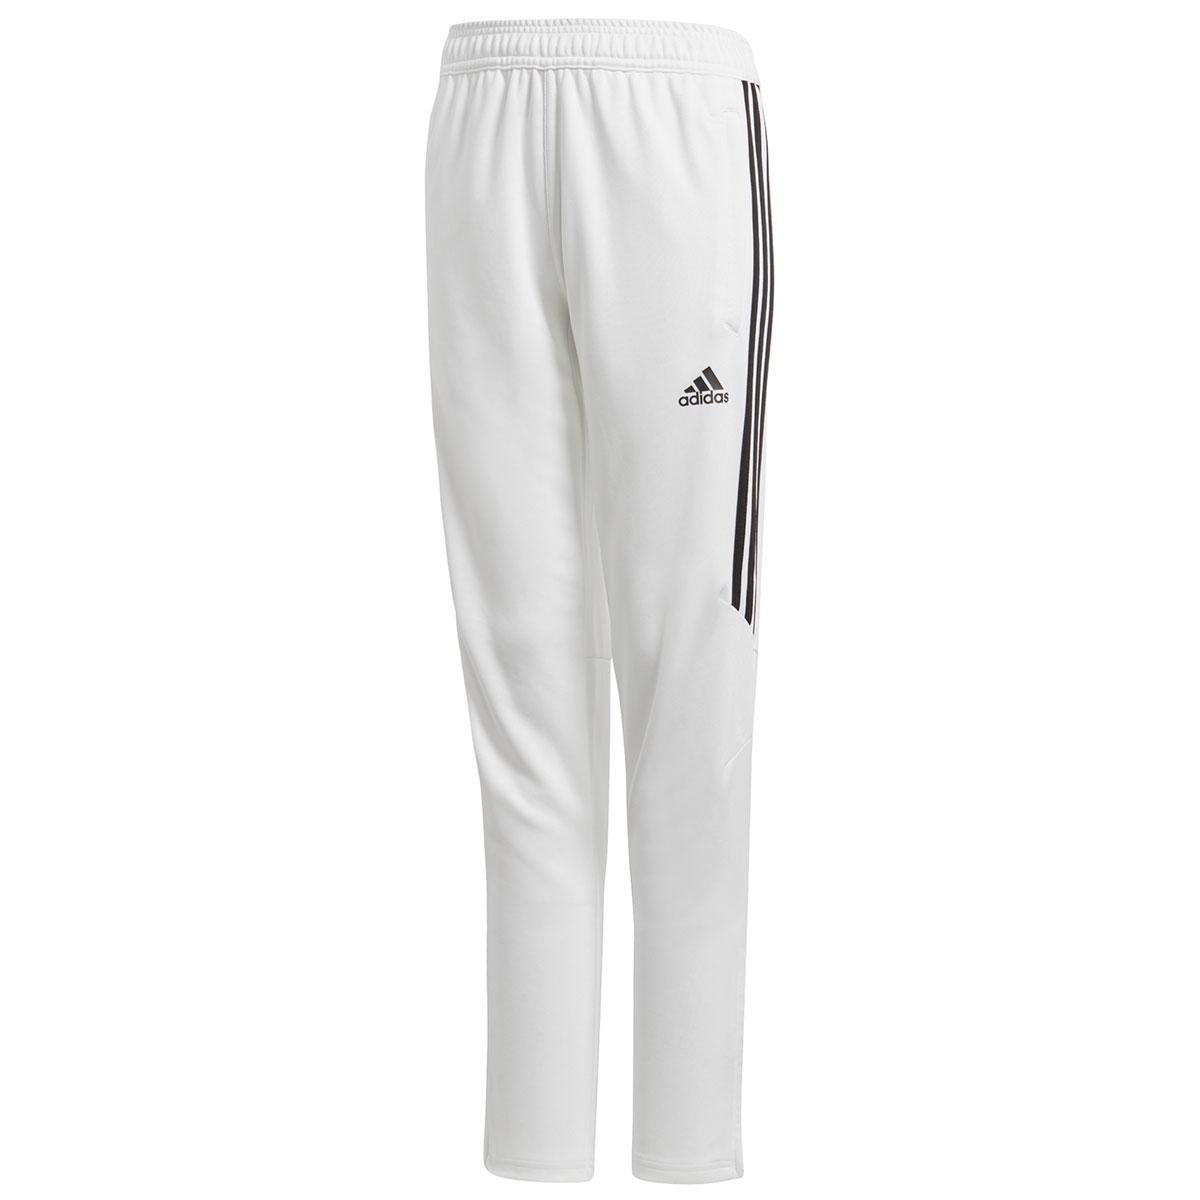 Adidas Boys' Tiro 17 Training Pants - White, XL